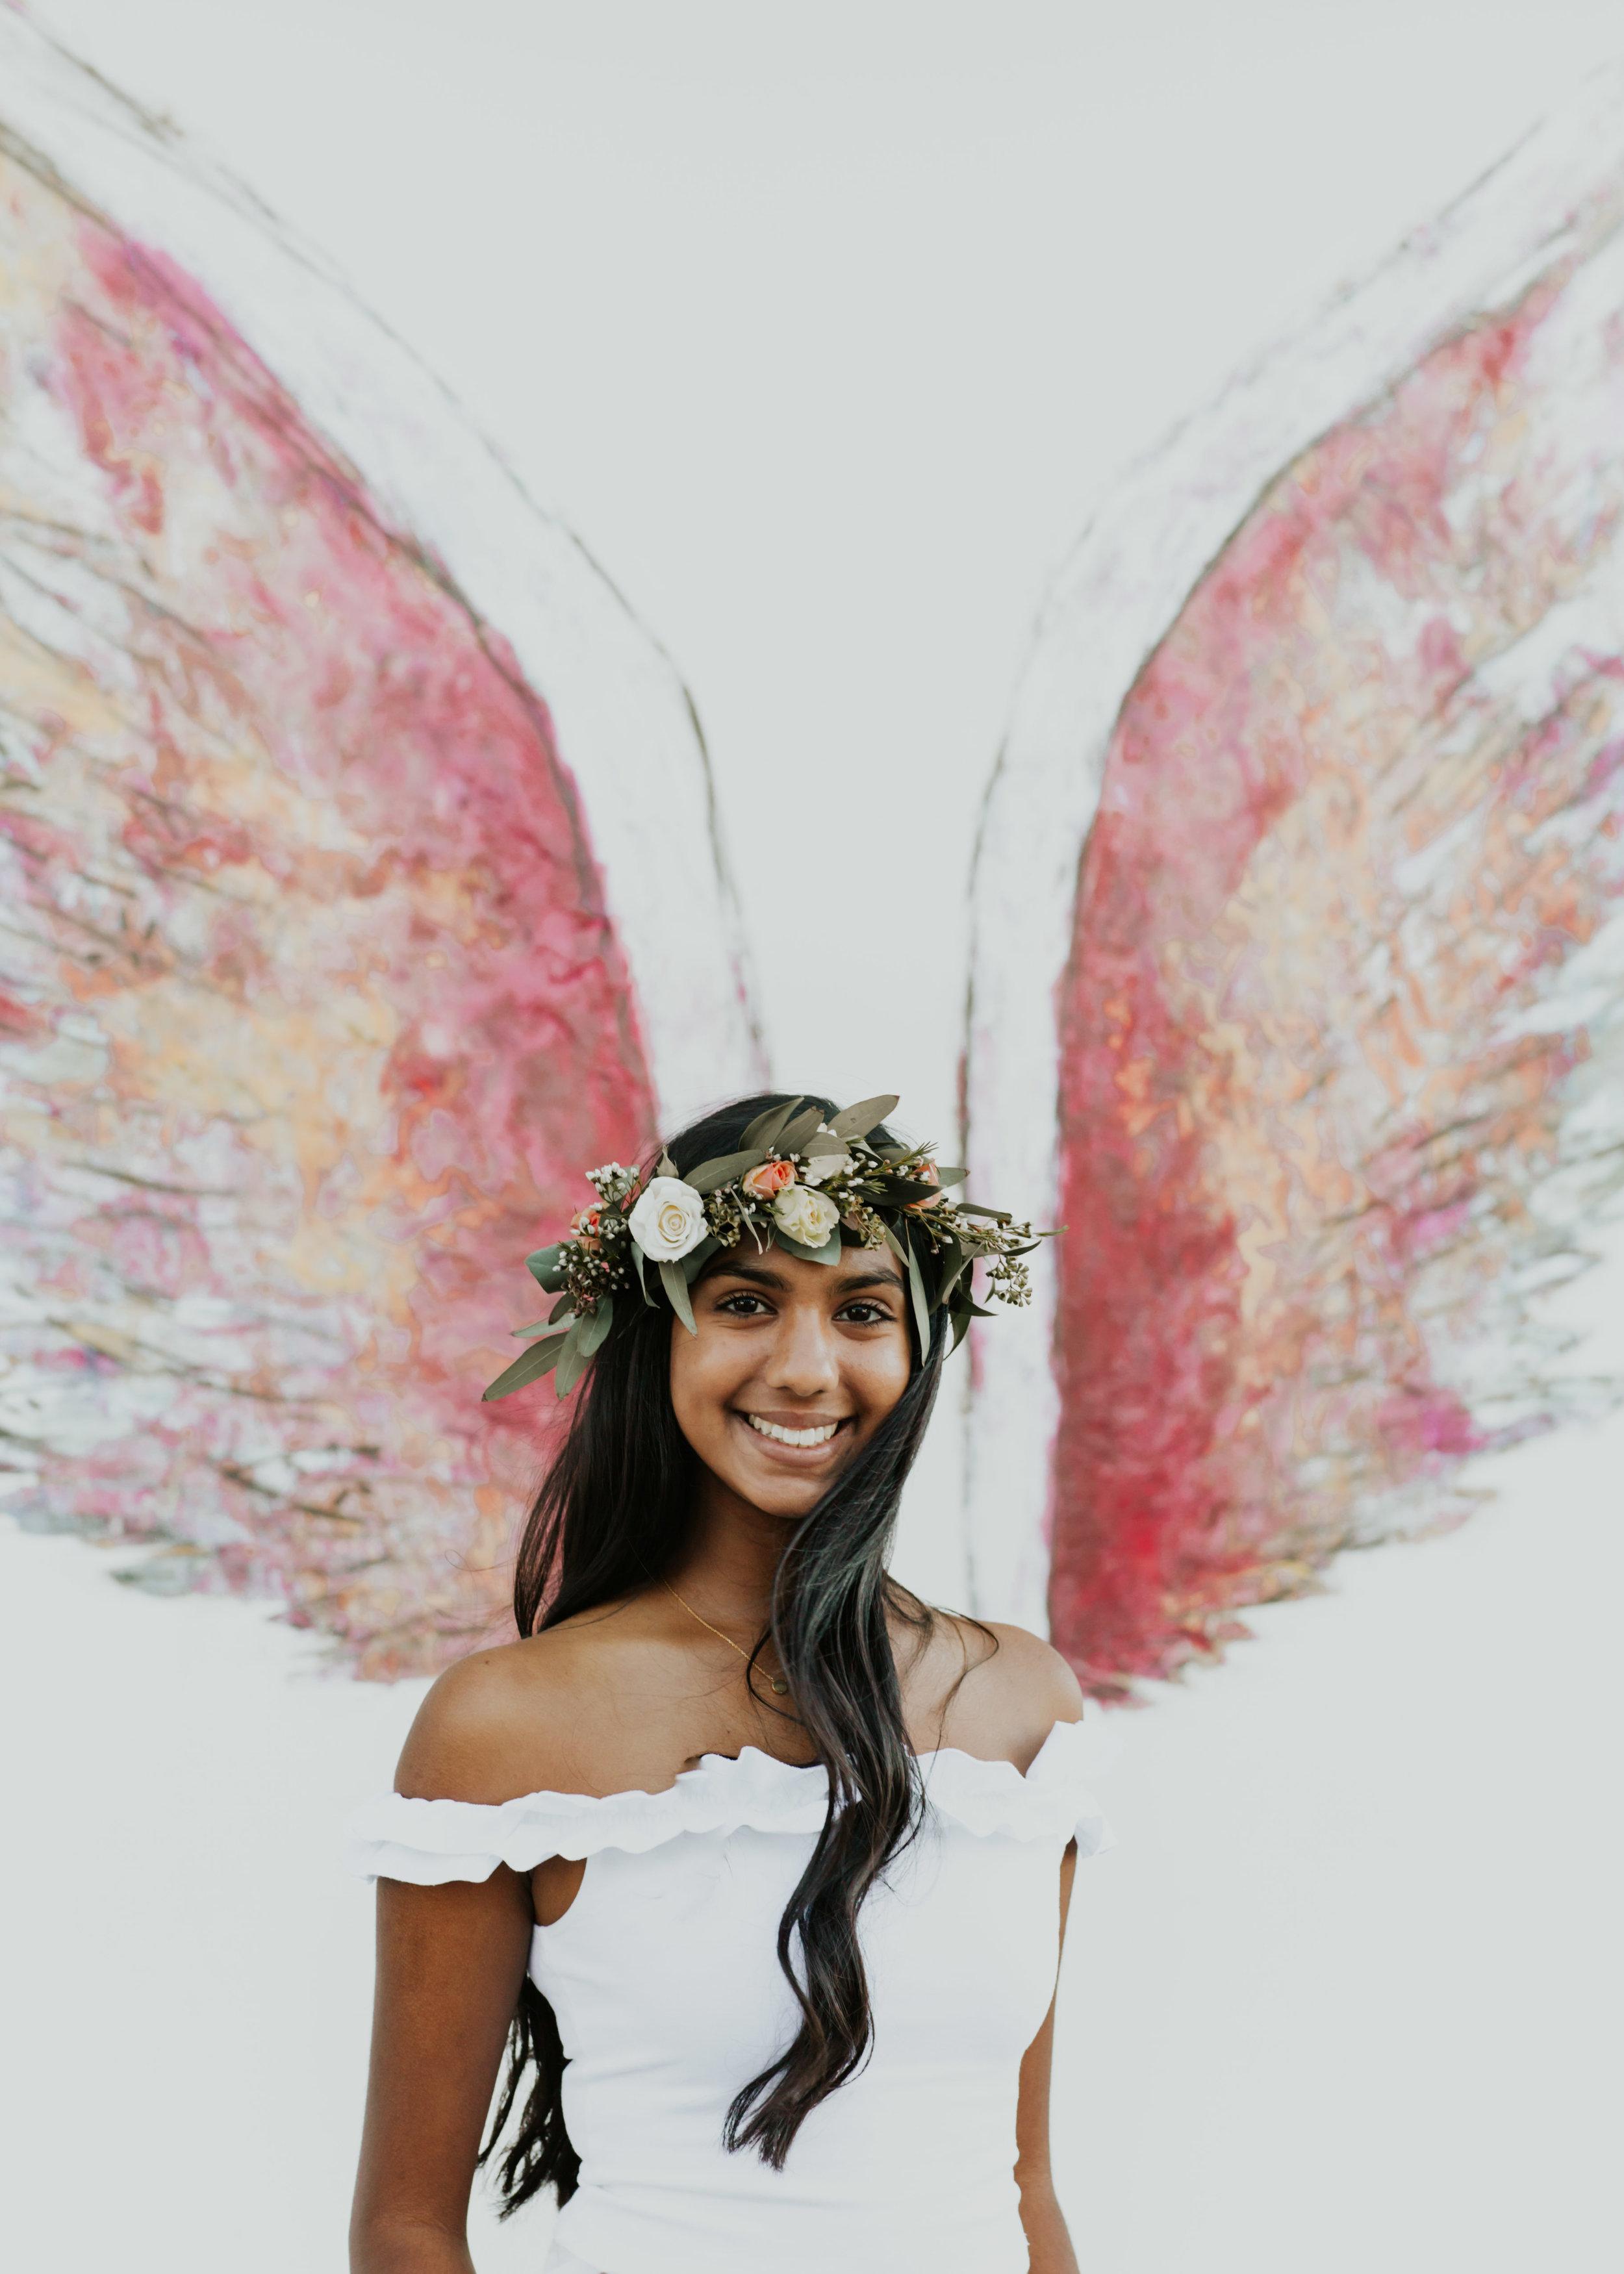 Alyssa | Raghu | Jacq and Jack | bonjour Nona | Lake Nona Social | Tavistock | The global angel wings project | Colette Miller | Vanessa Boy (14 of 15).jpg